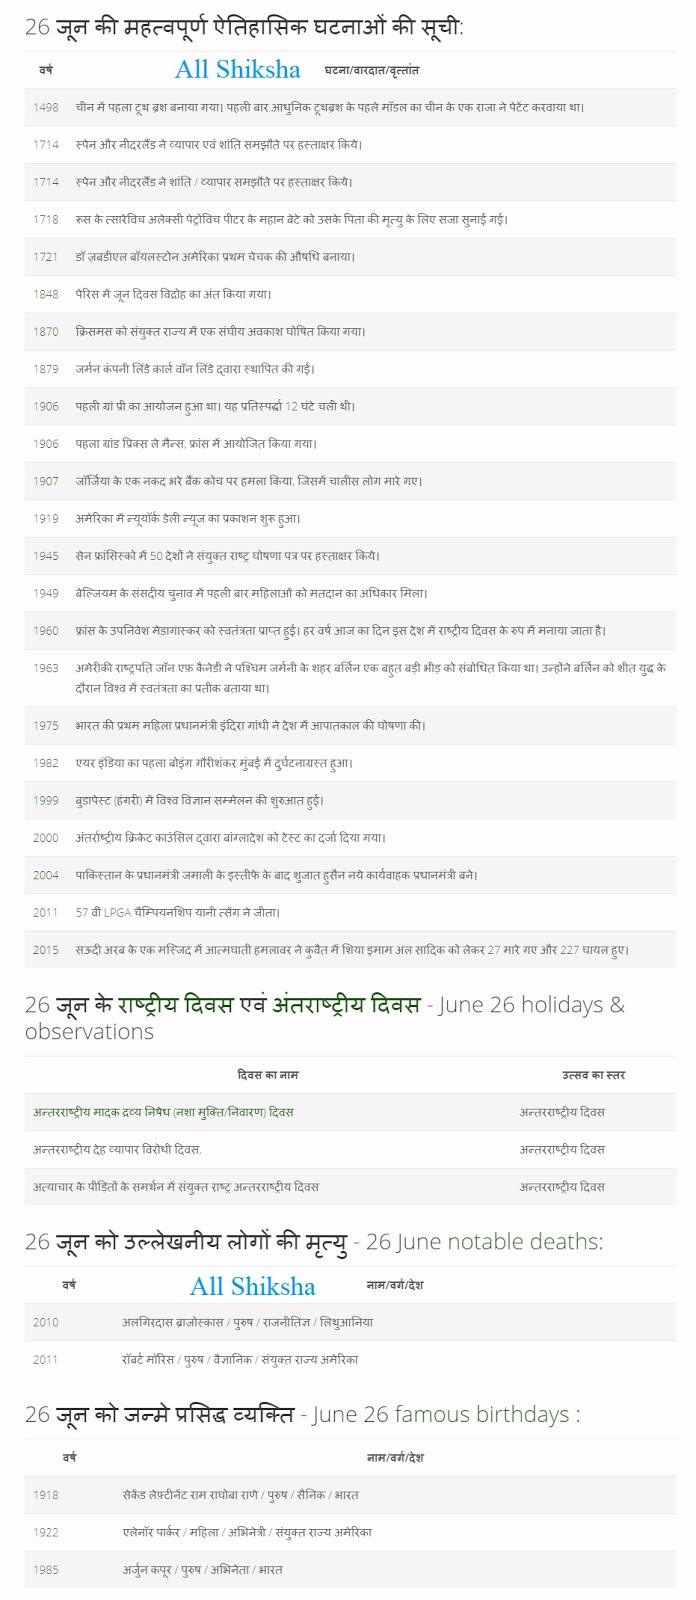 History of 26 June